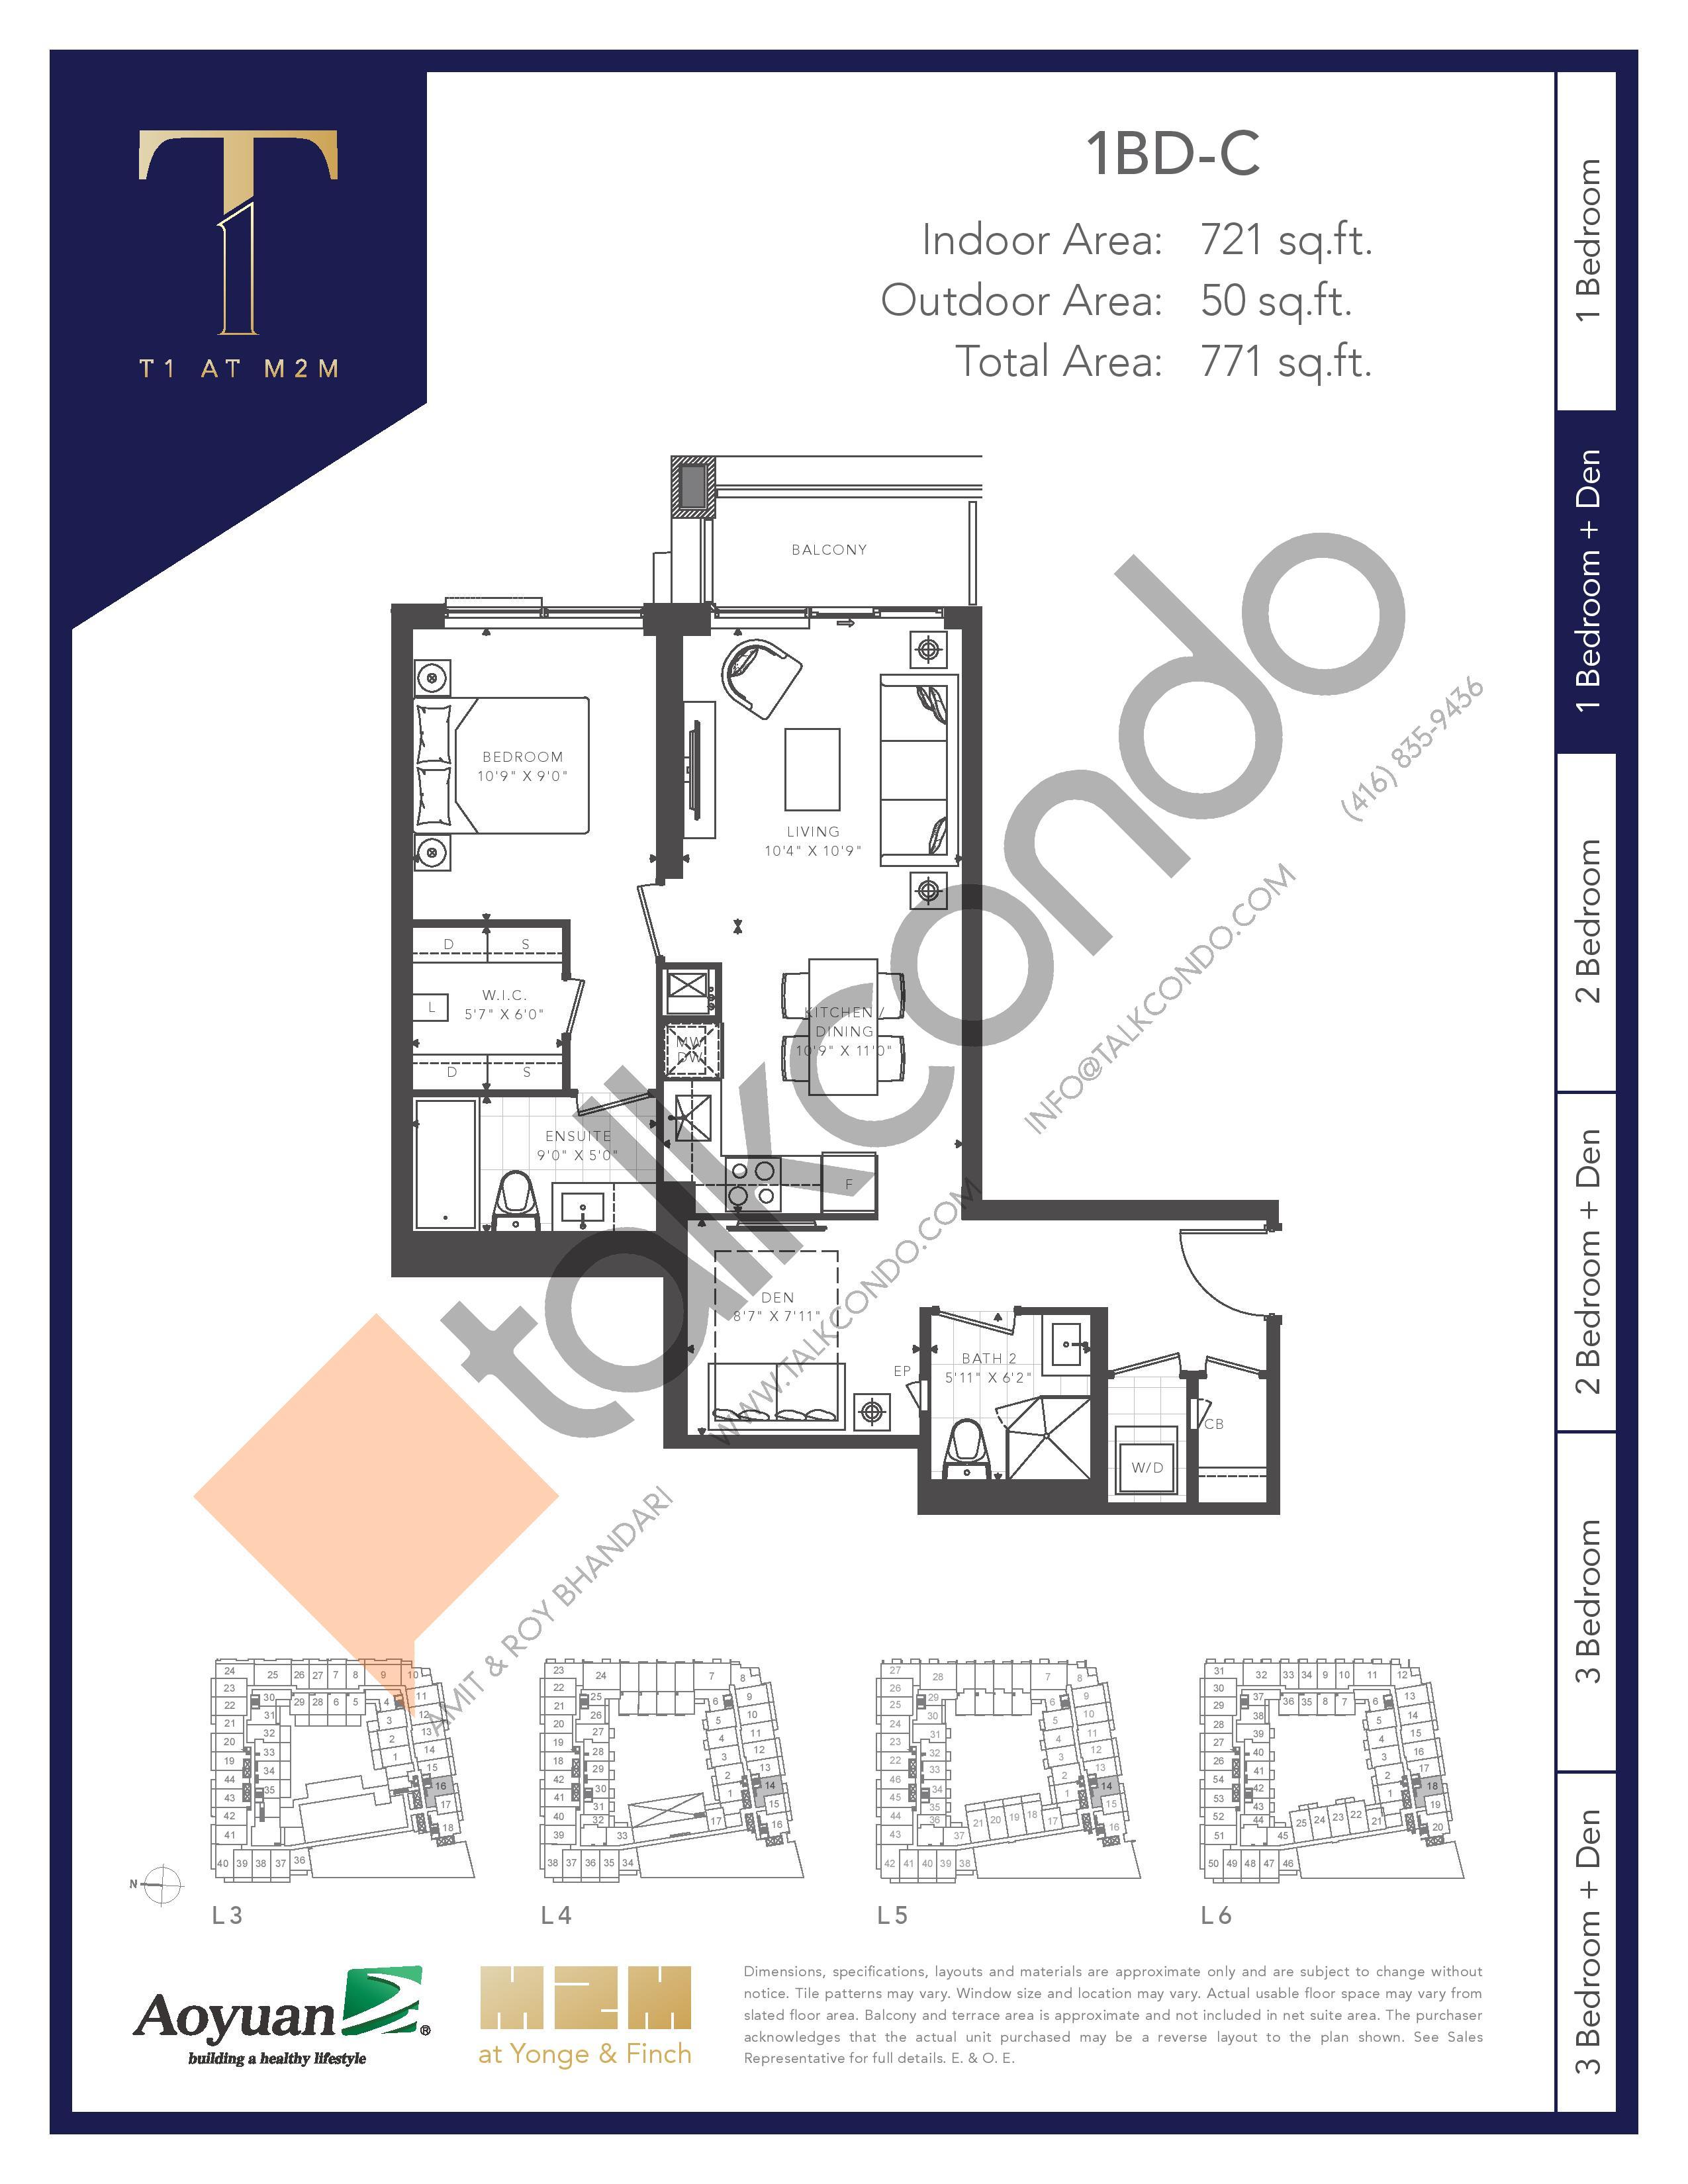 1BD-C (Tower) Floor Plan at T1 at M2M Condos - 721 sq.ft